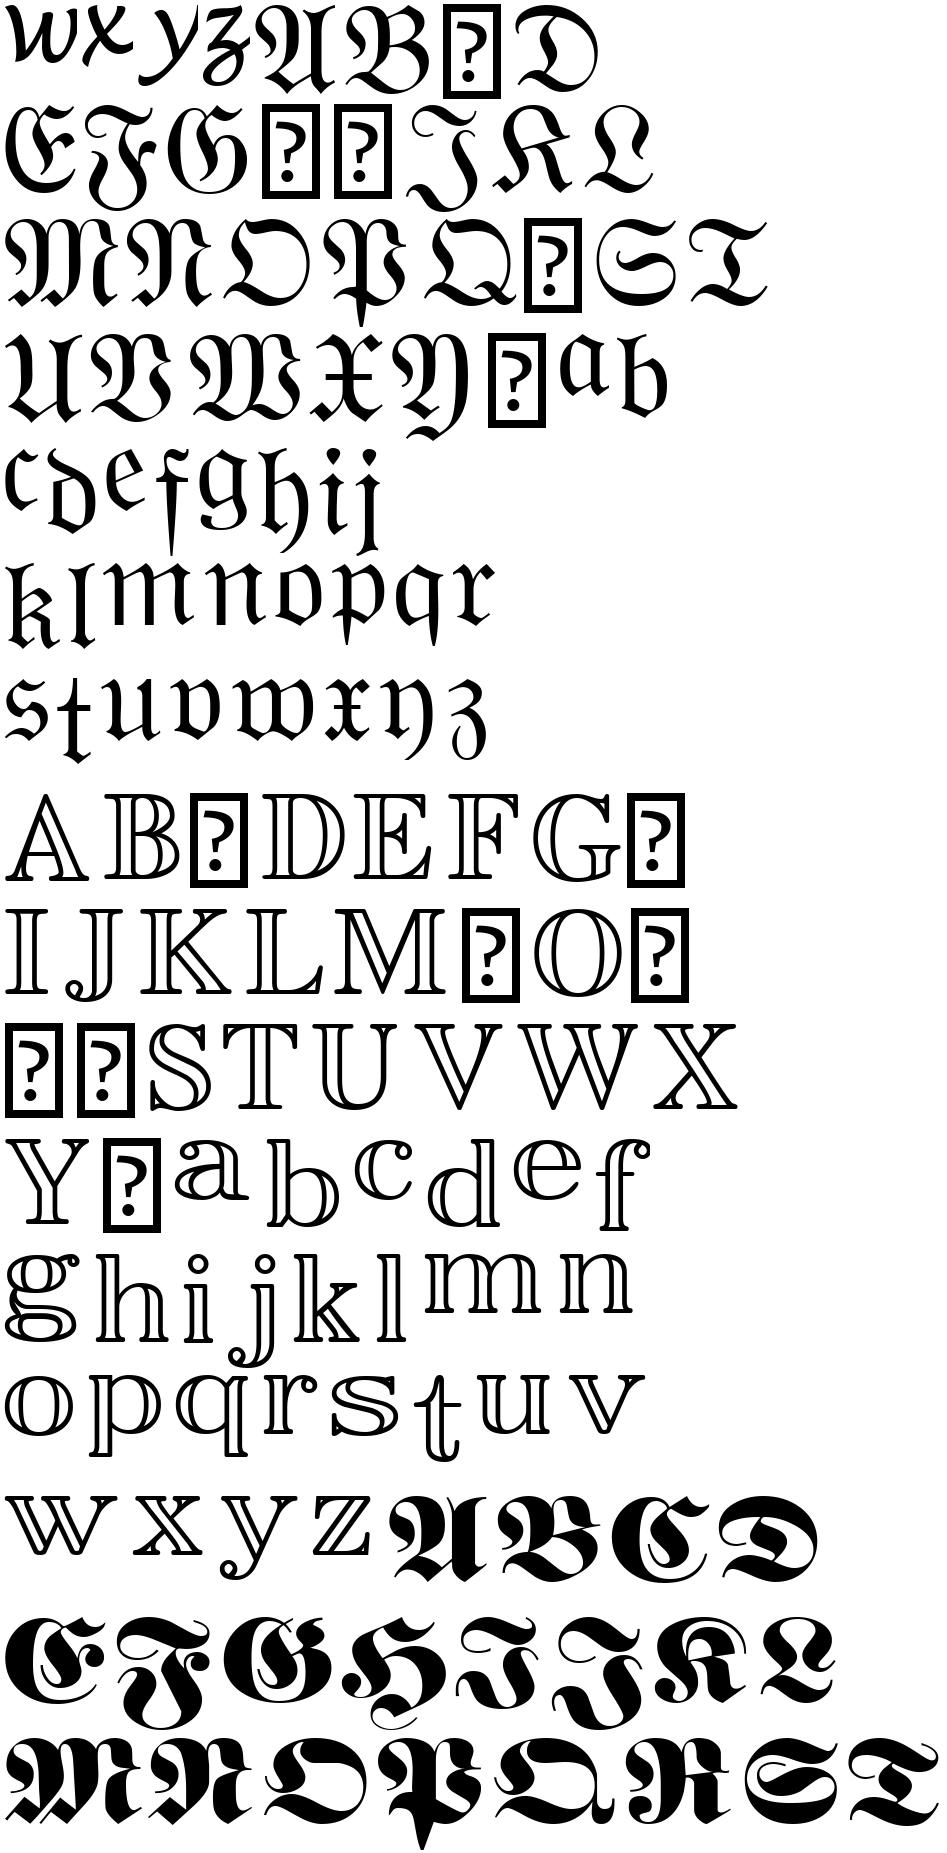 Scriptsource Mathematical Bold Script Small X